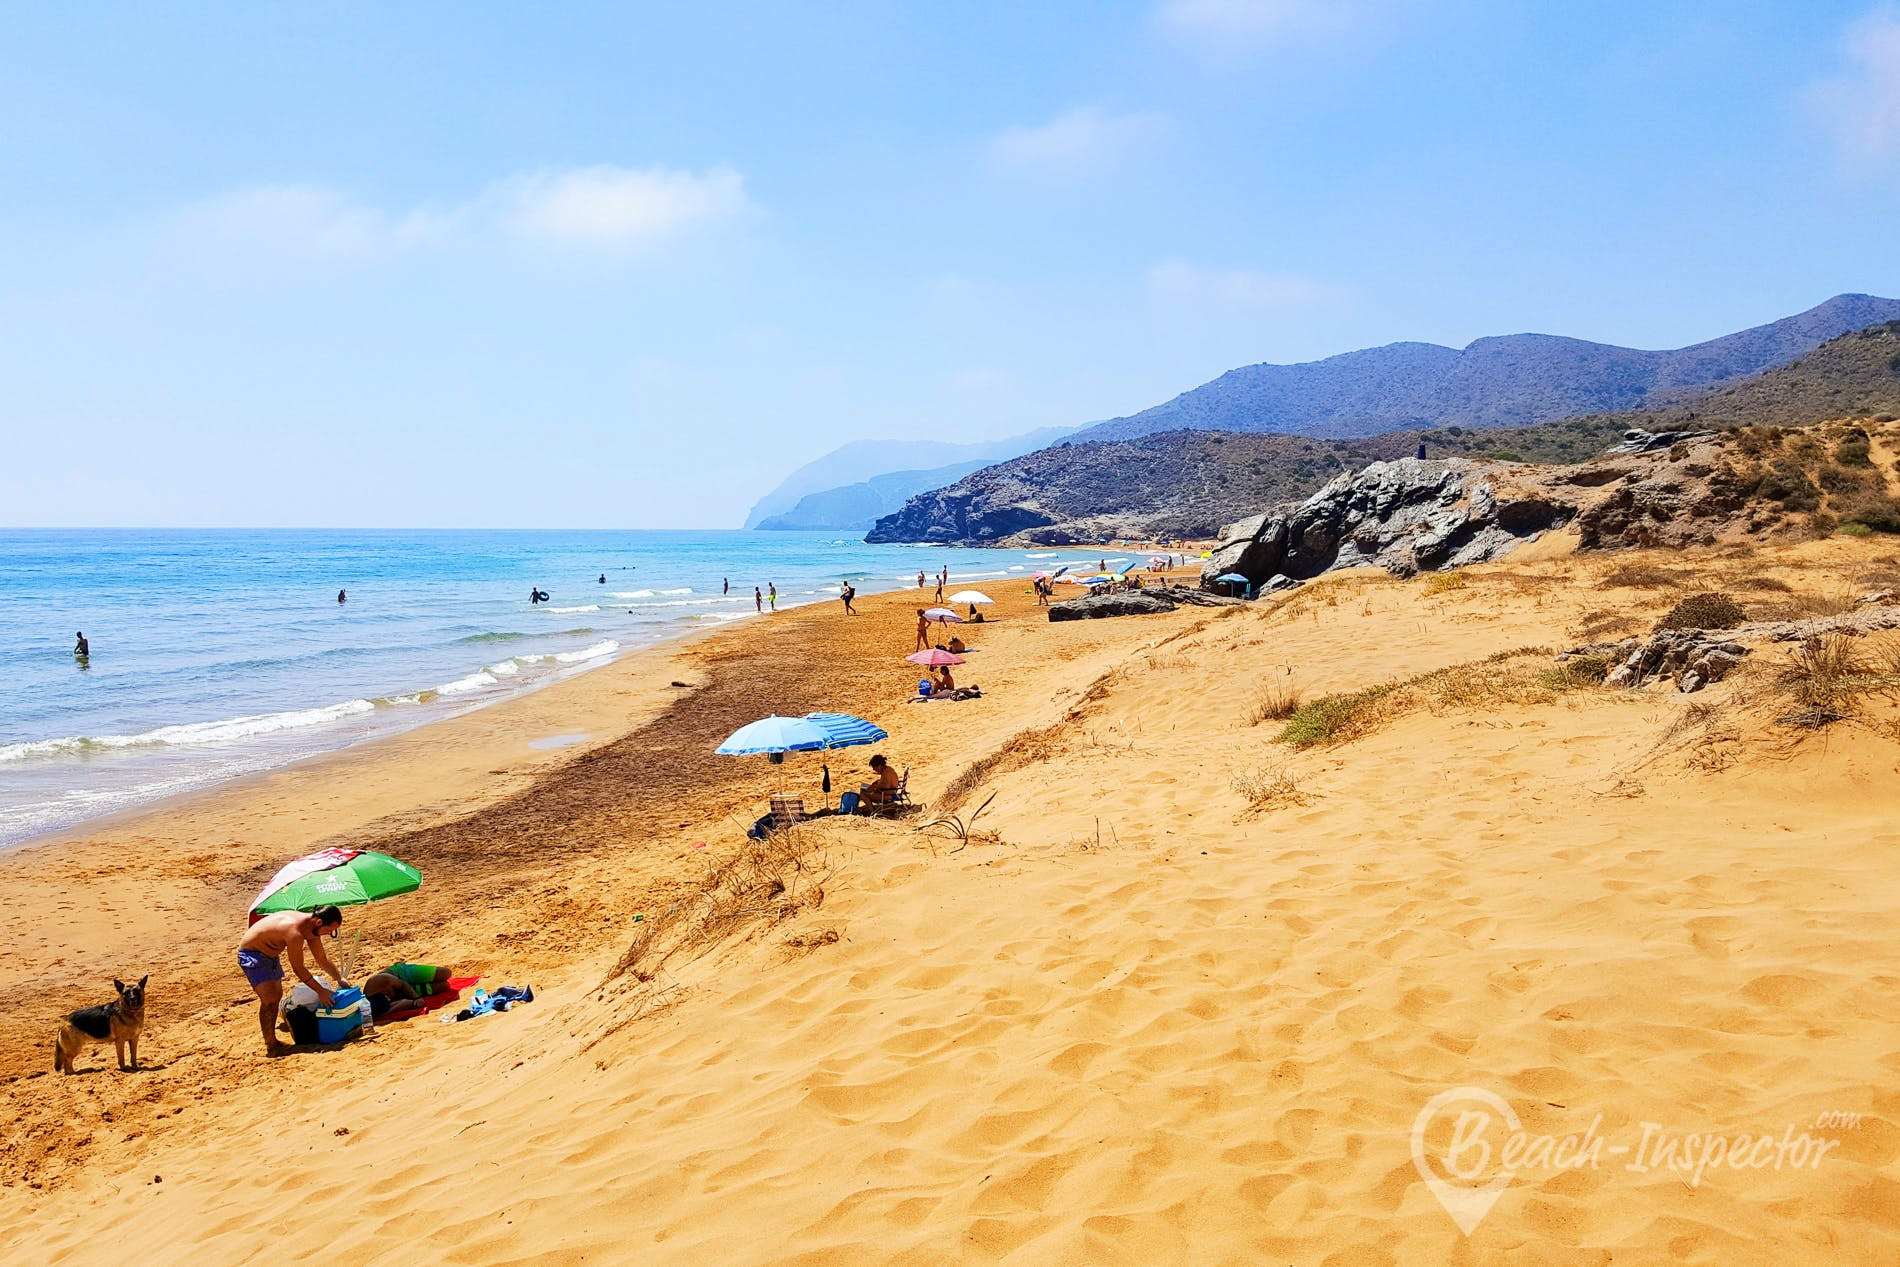 Beach Playa de Calblanque, Costa Cálida, Spain